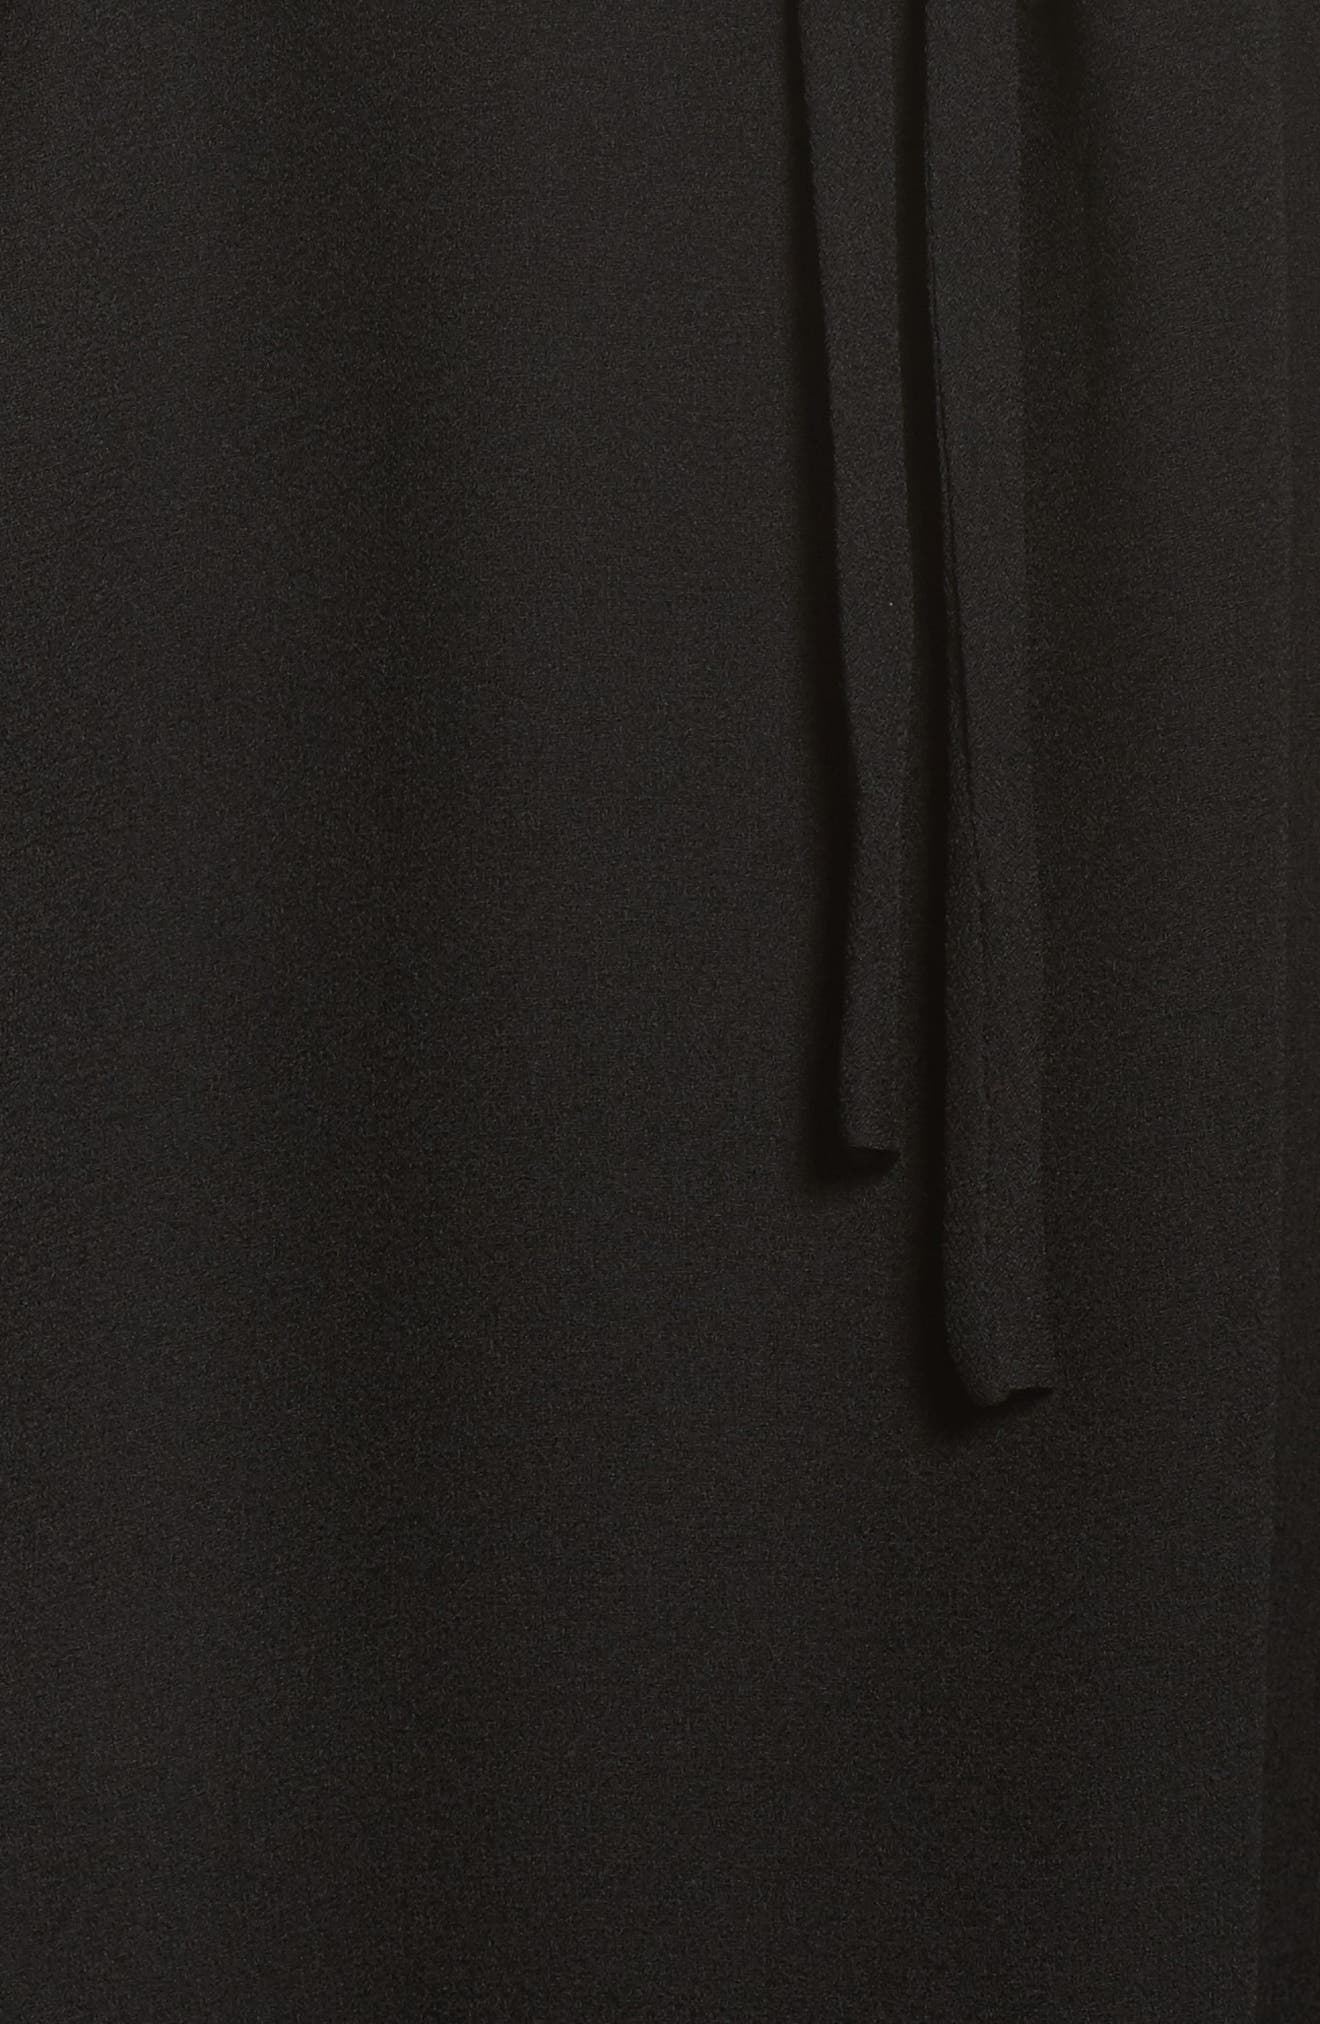 Kayla One-Shoulder Maxi Dress,                             Alternate thumbnail 5, color,